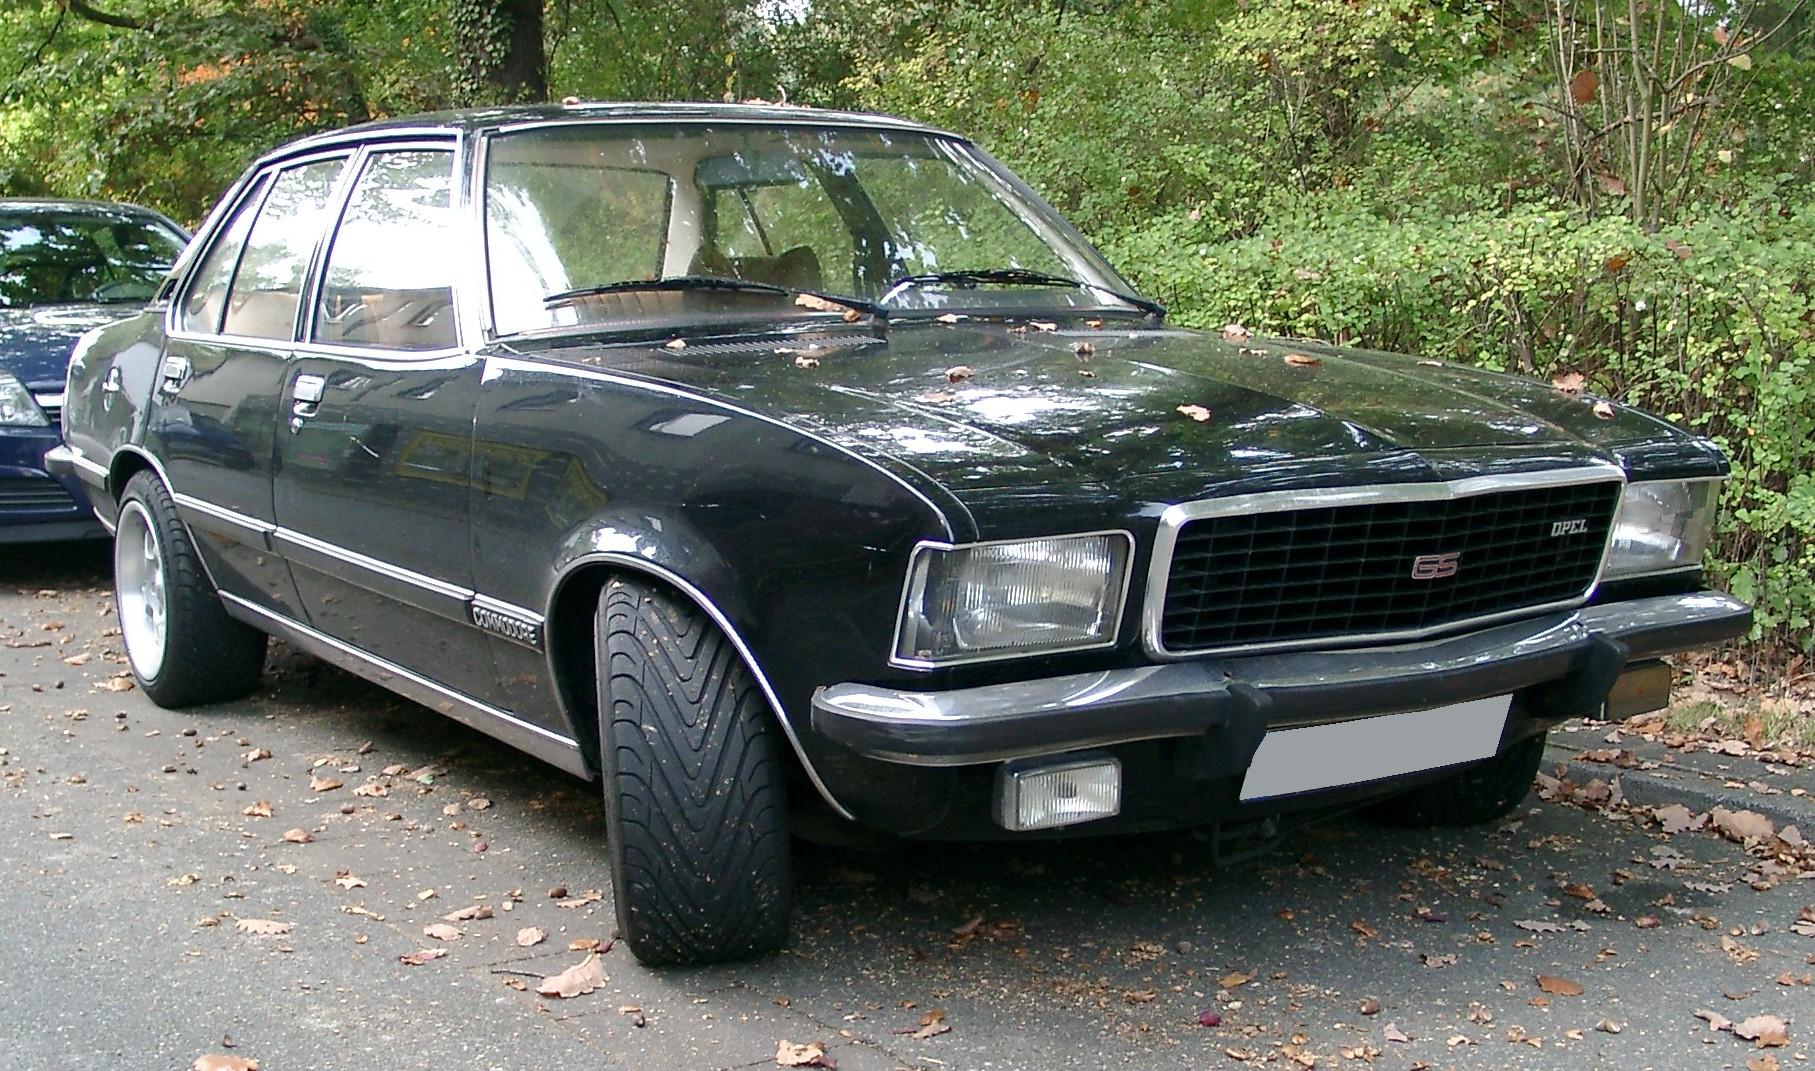 A doua maisni achizitionata de omul de afaceri a fost un Opel Commodore (sursa foto - commons.wikimedia.org)